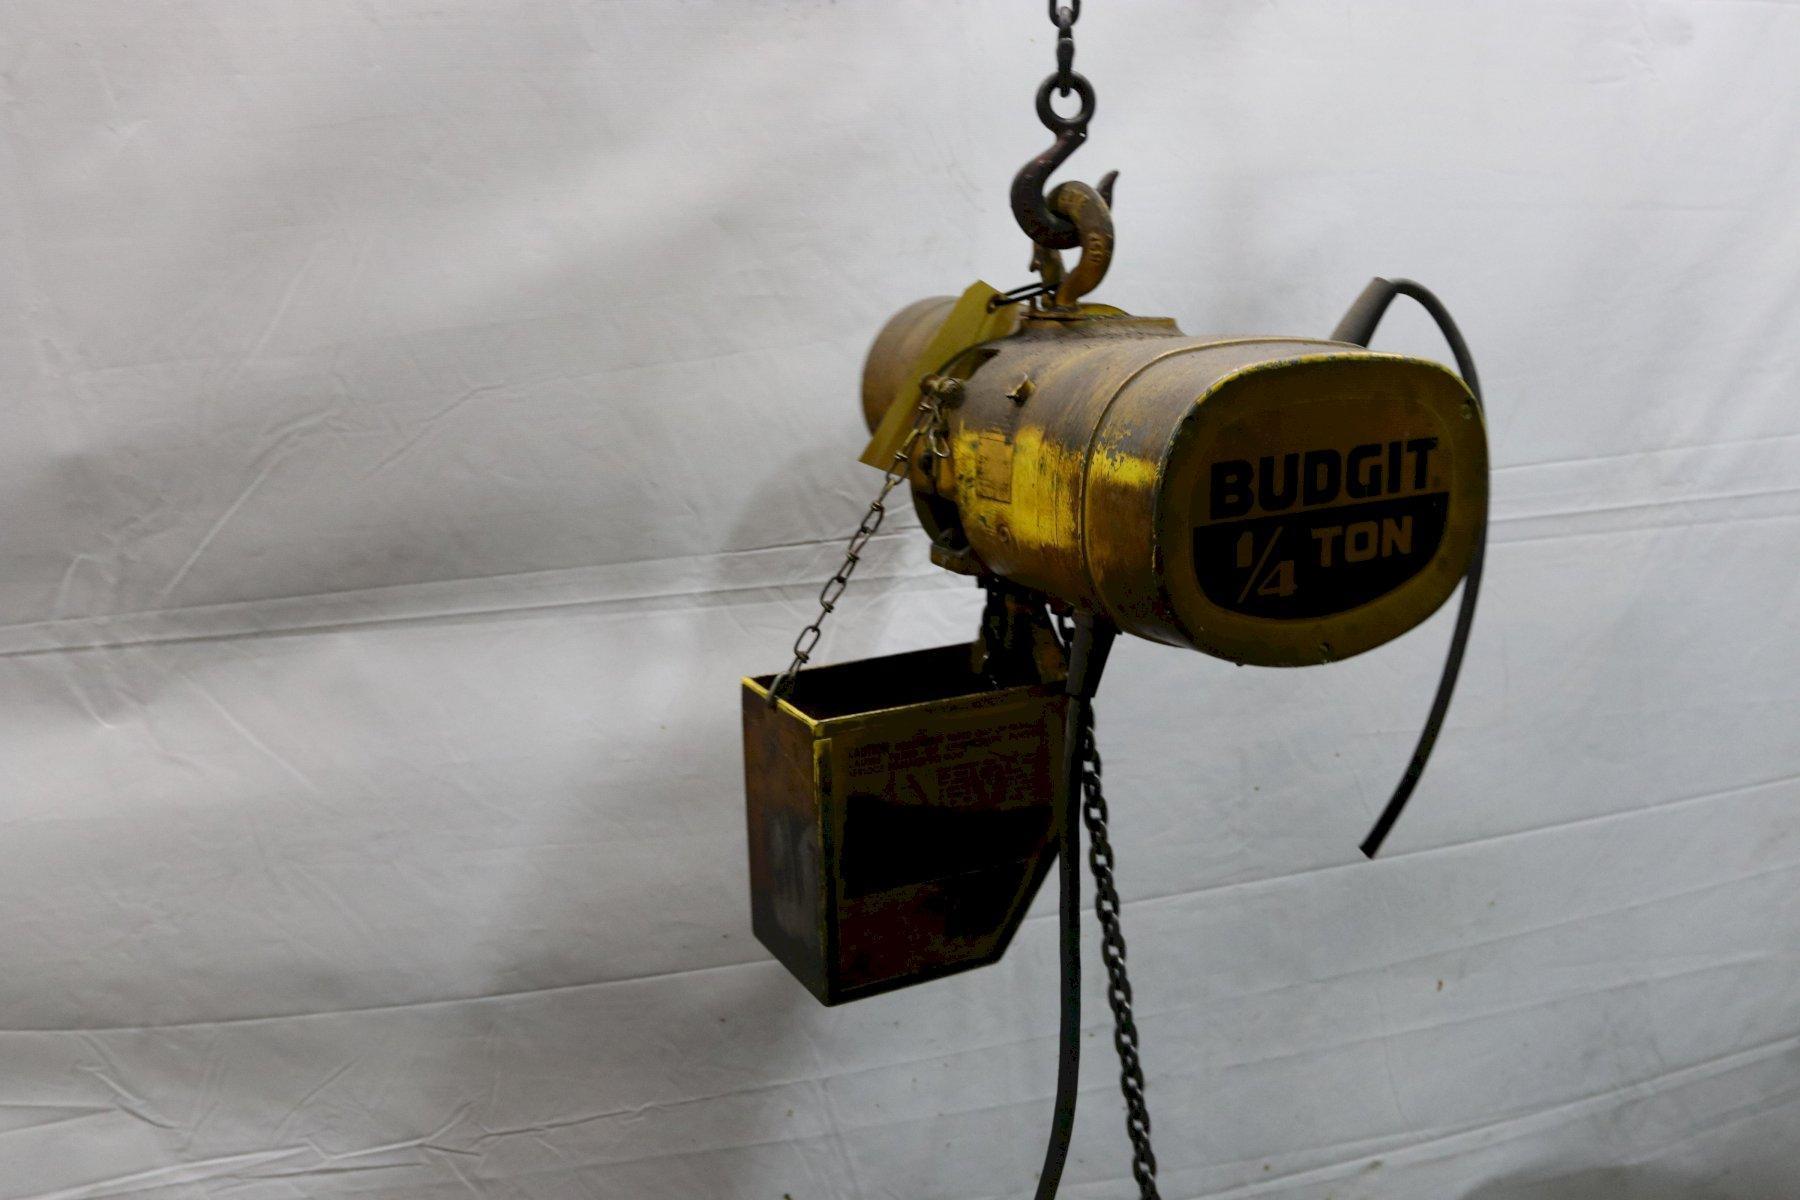 500 LB BUDGIT ELECTRIC POWERED CHAIN HOIST: STOCK #11975